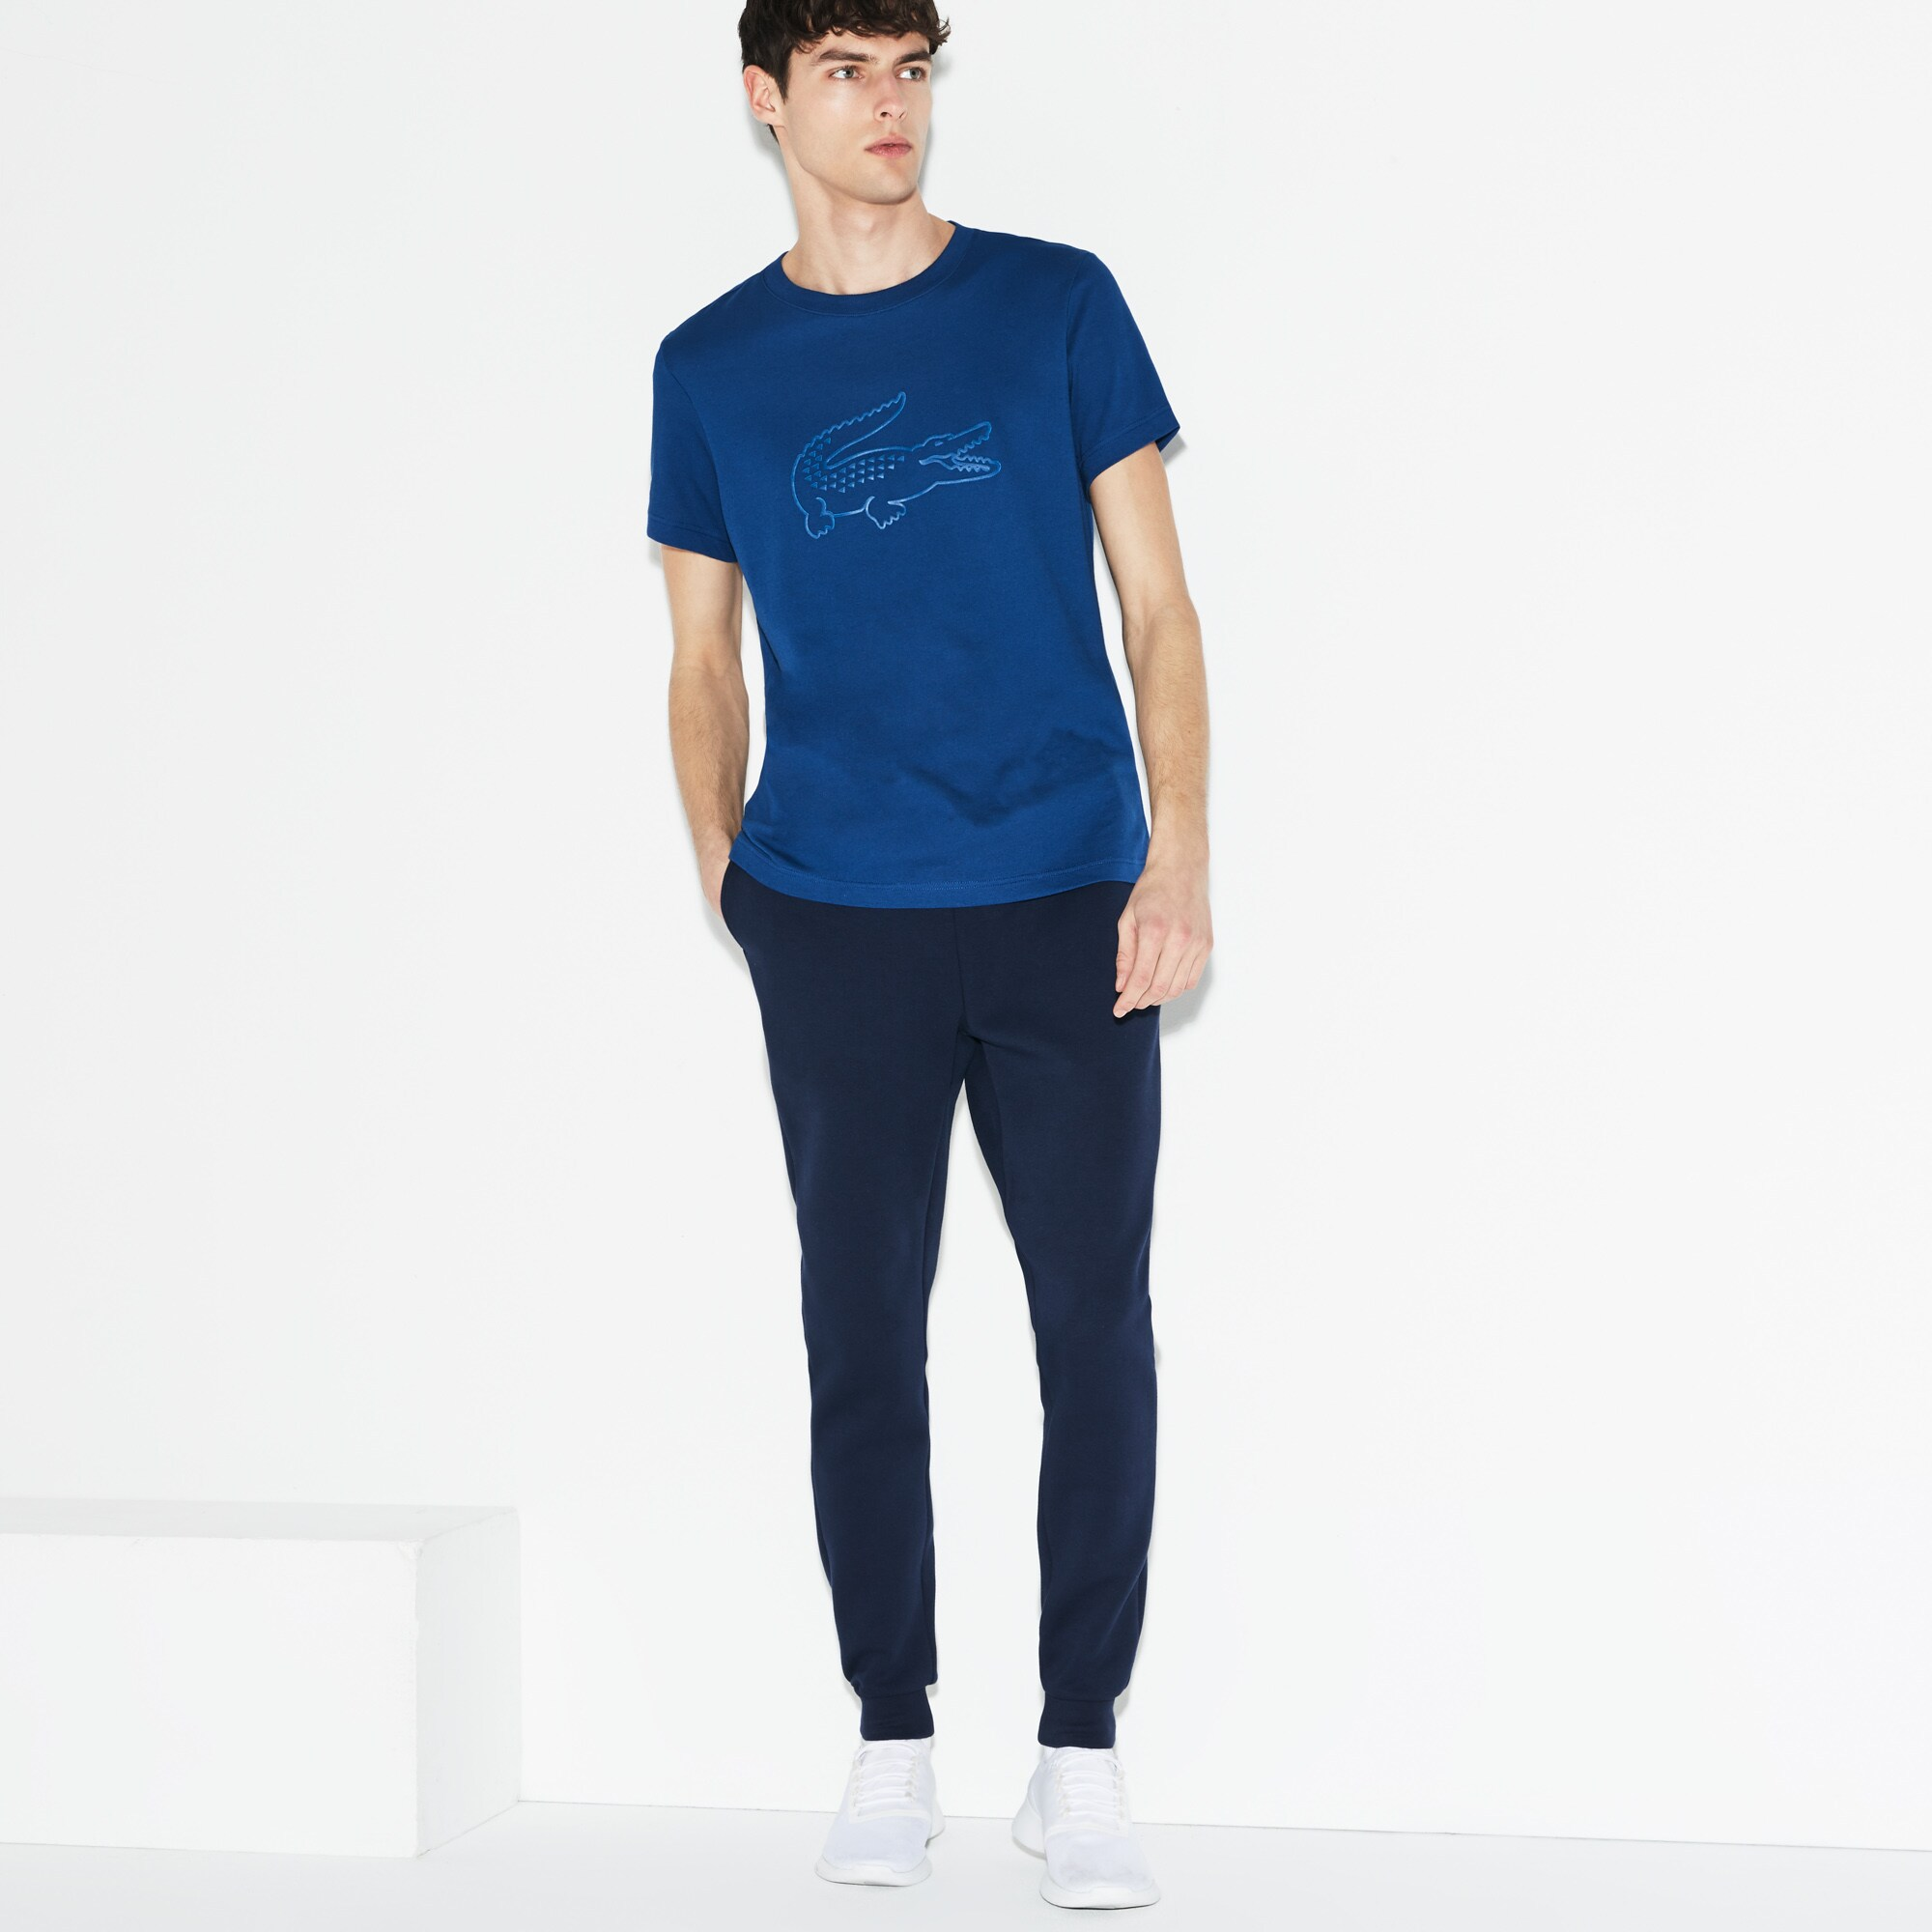 Herren LACOSTE SPORT Tennis T-Shirt mit großem Krokodil